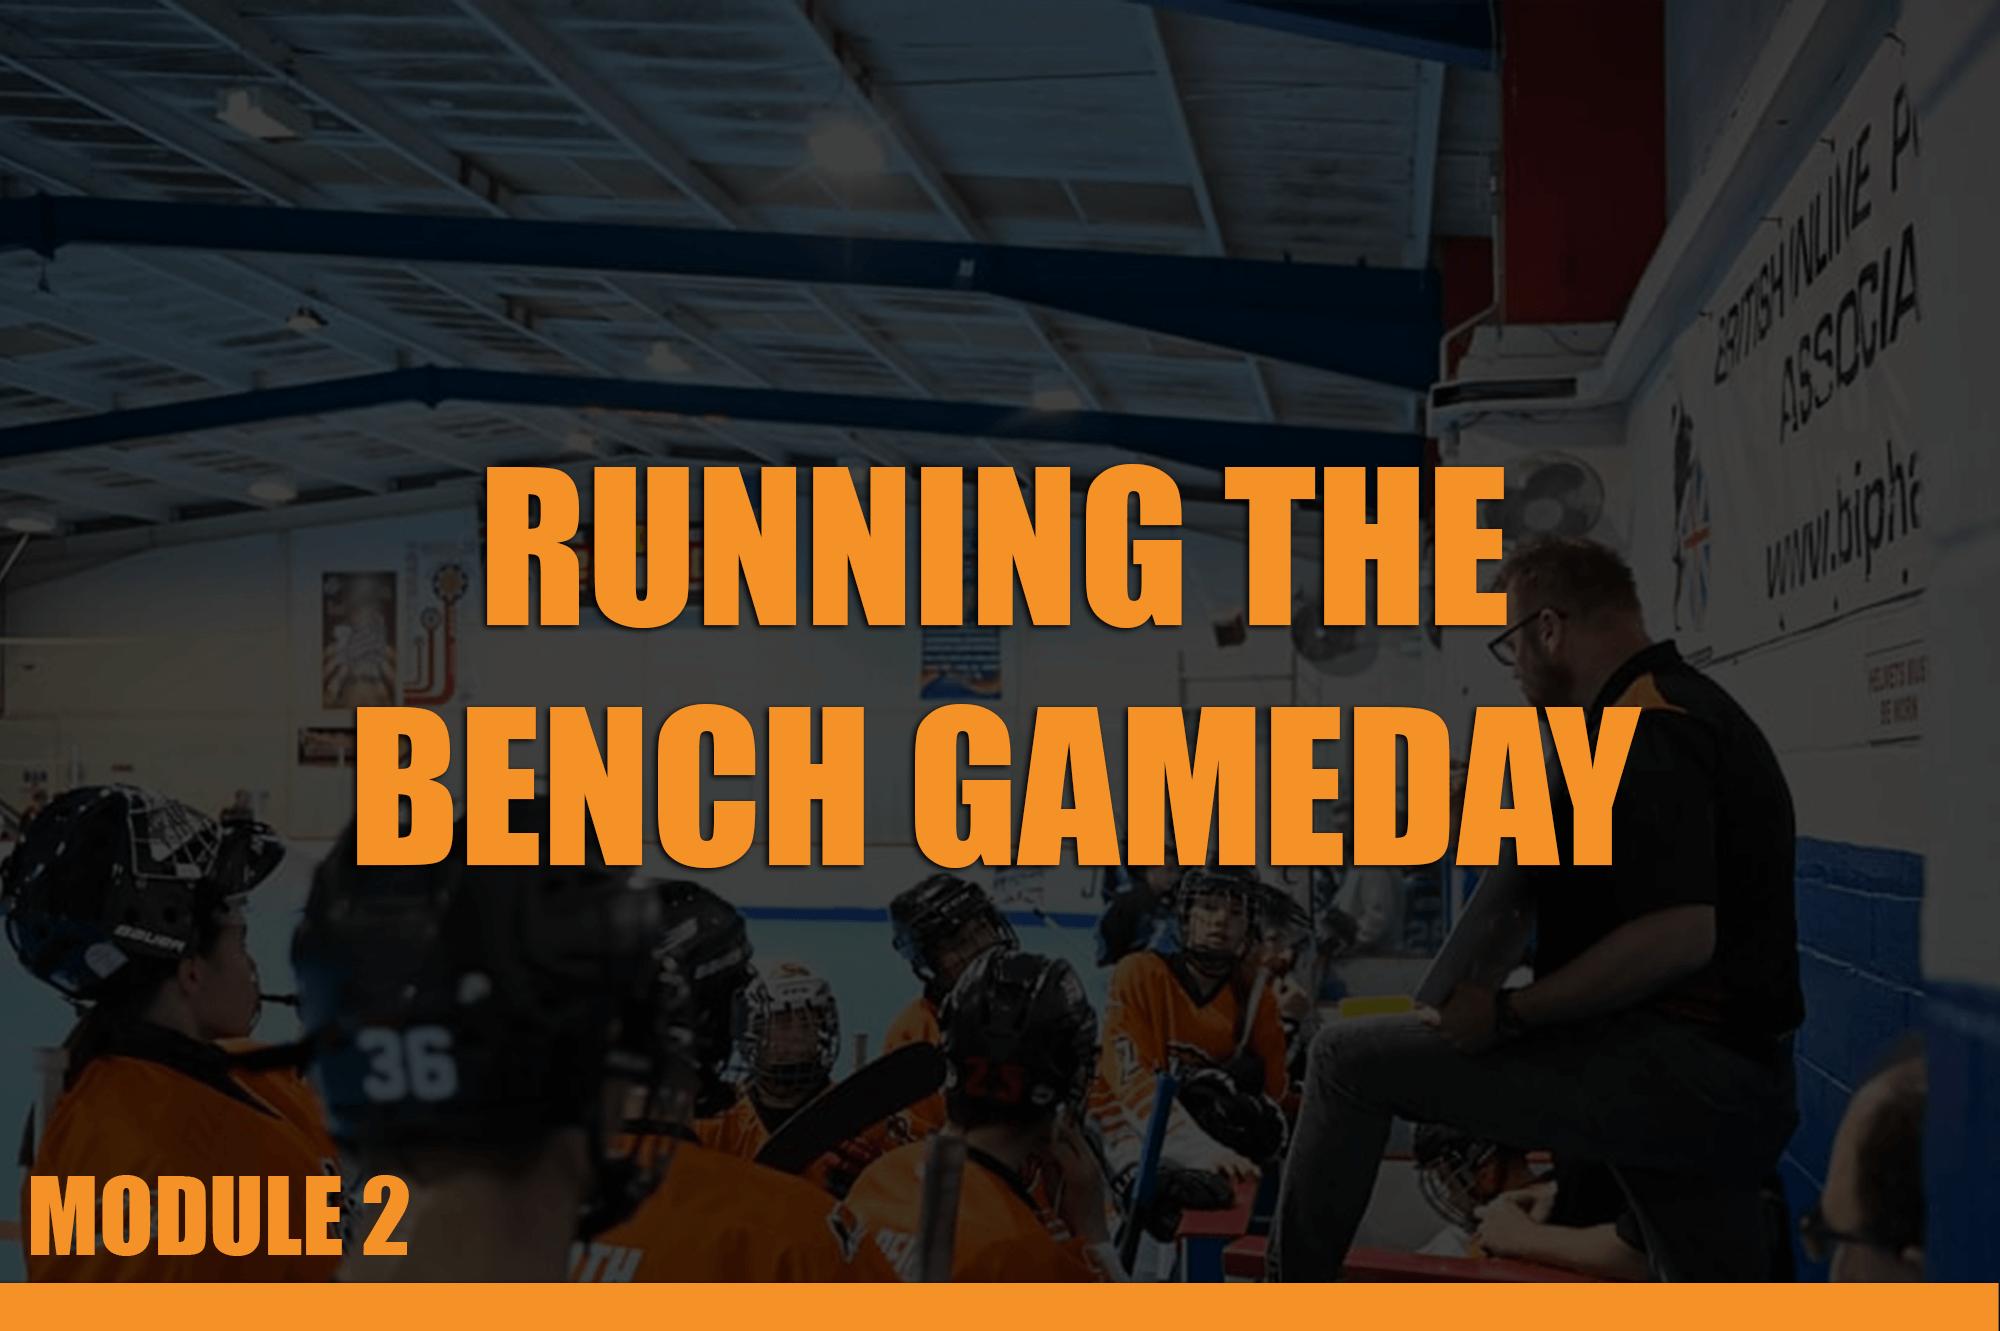 Module 2 running the bench gameday